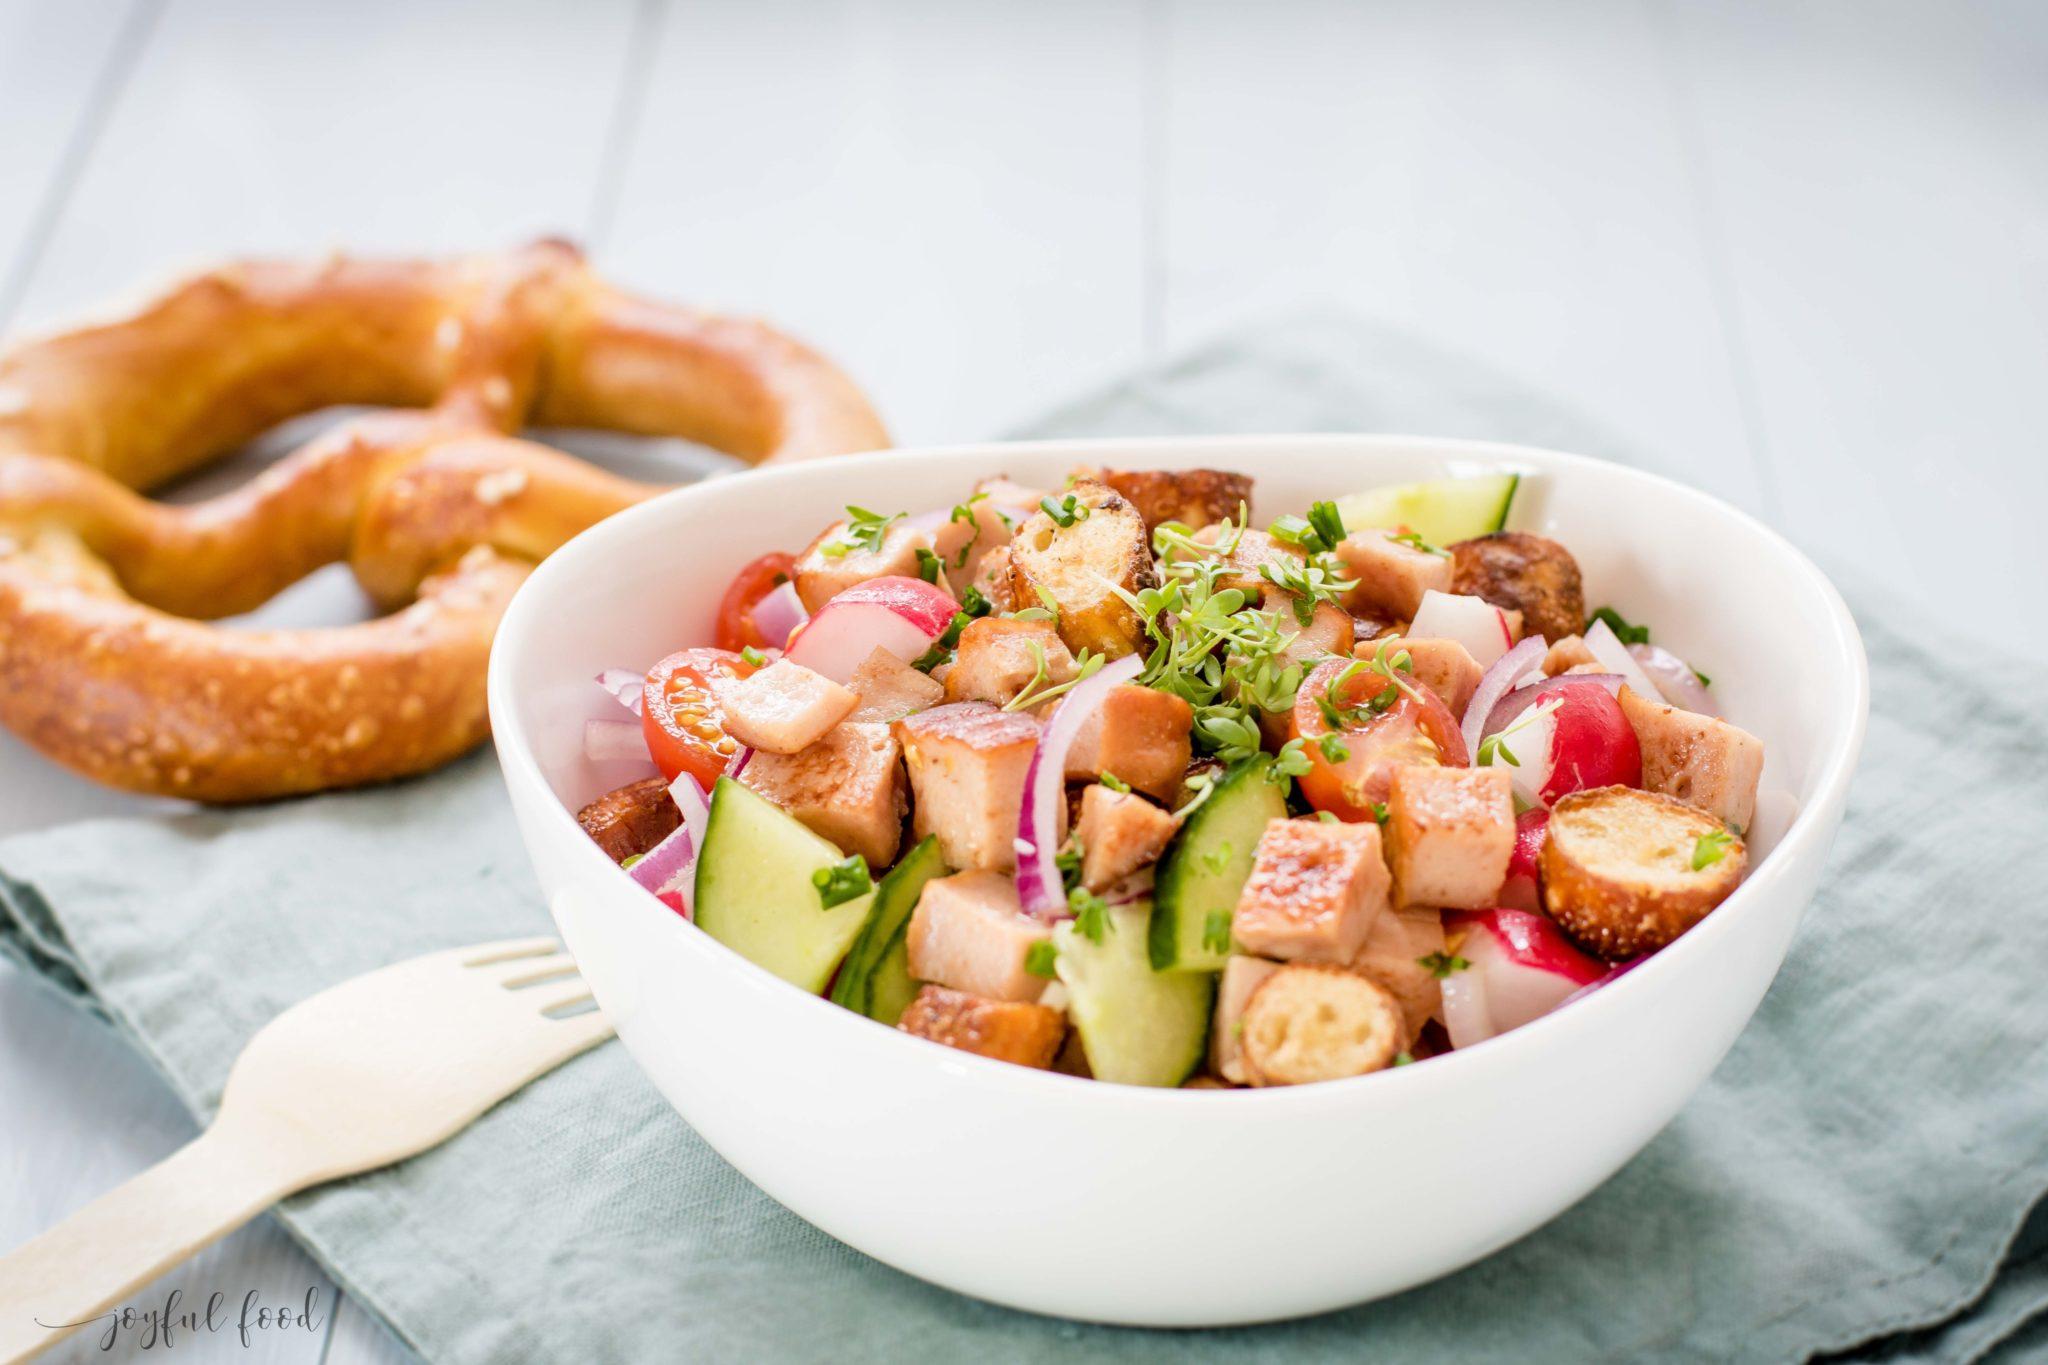 Knuspriger Lerberkäse Brezen Salat Bayerisch Und Deftig Joyful Food